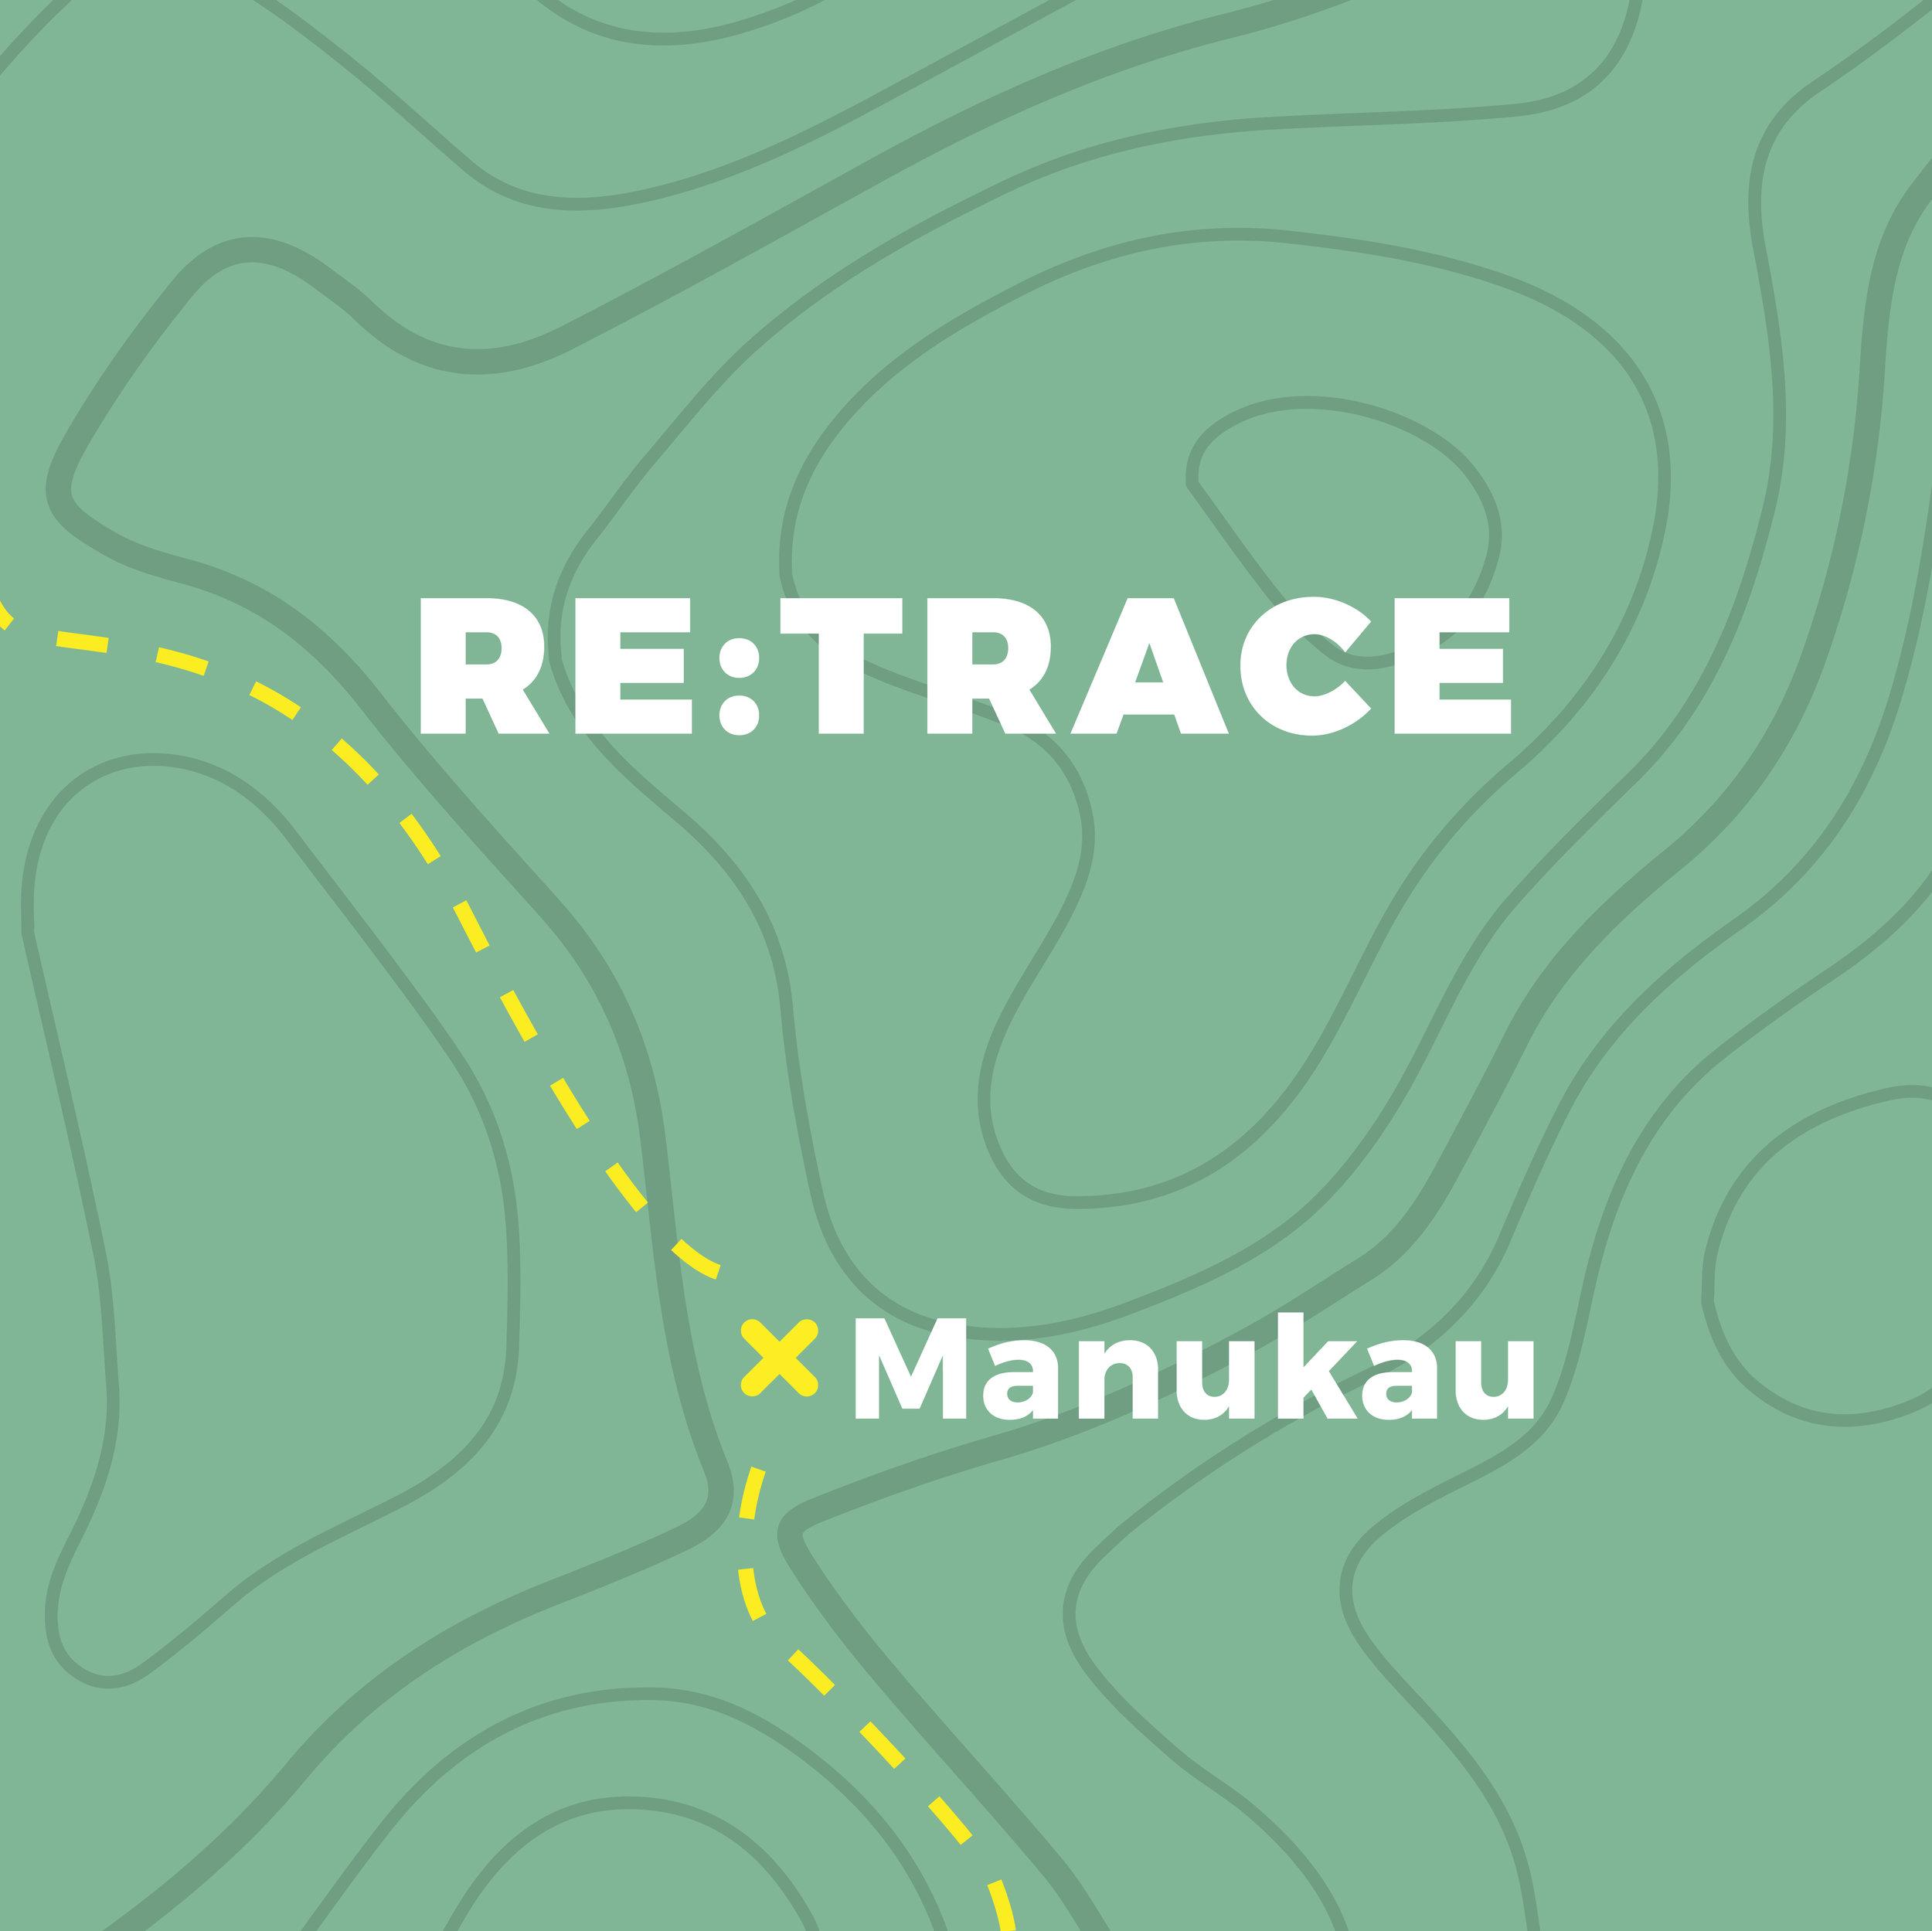 Places Trio Manukau-14.jpg